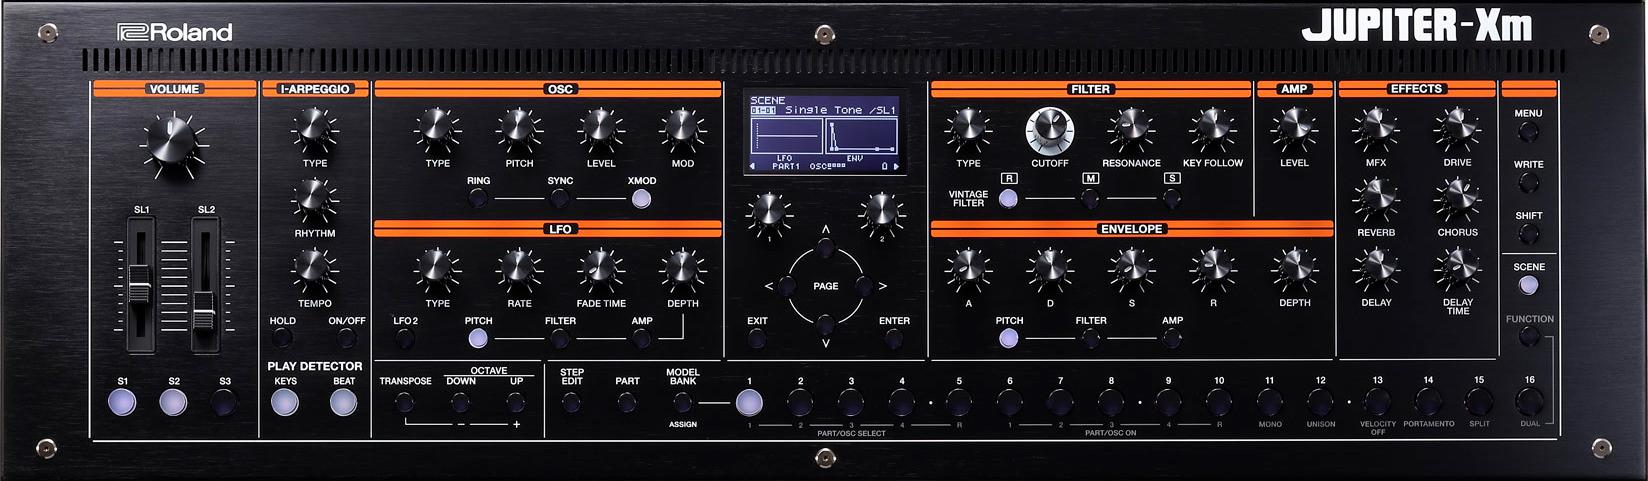 Roland Jupiter-Xm Review